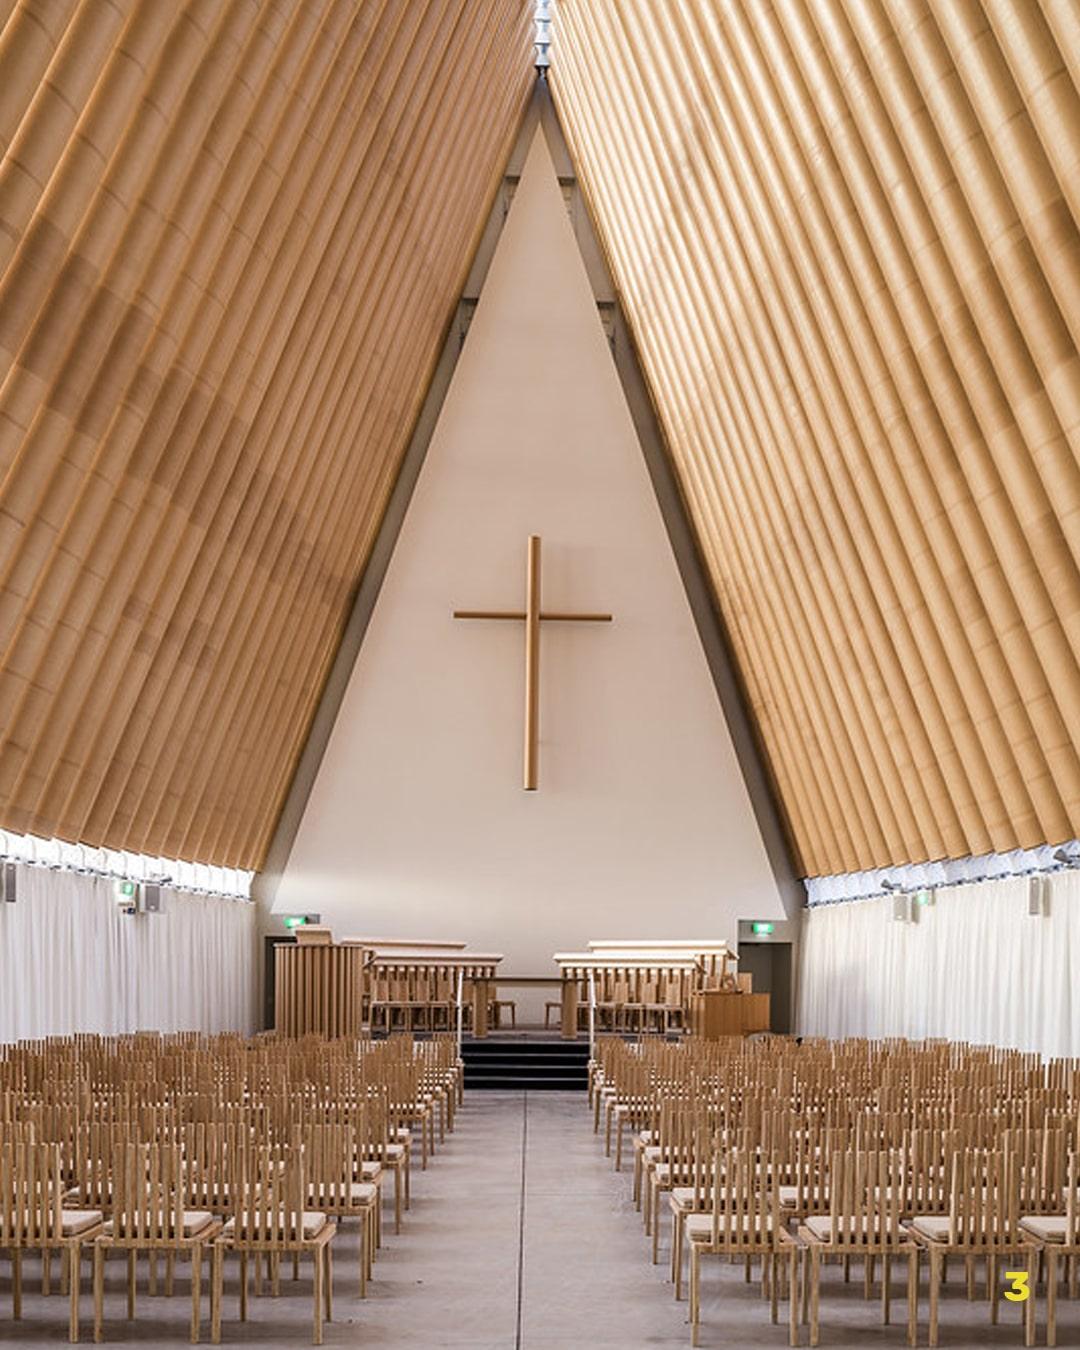 Shigeru Ban Cardboard Cathedral design ecosostenibile